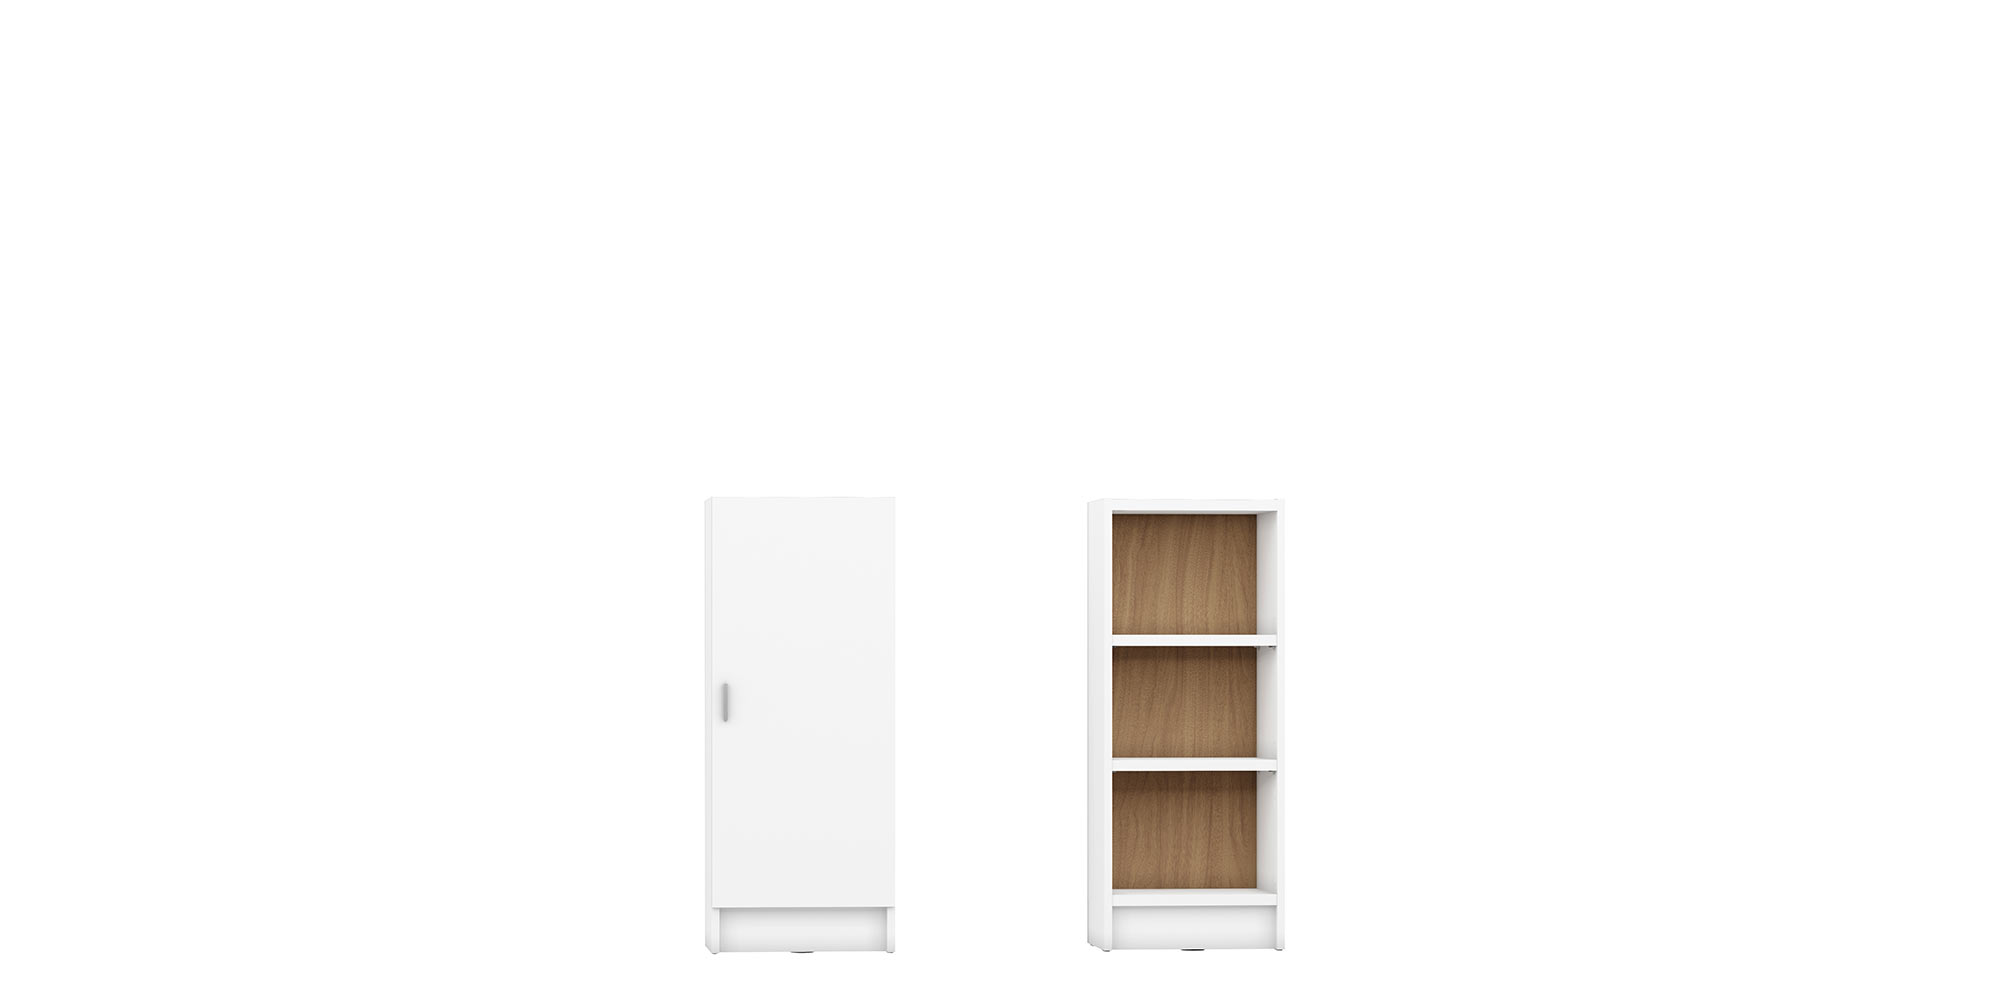 Greenwich White Matte Maple Cream 3 Shelf Narrow Tall 2 0 Bookcase W Doors By Manhattan Comfort